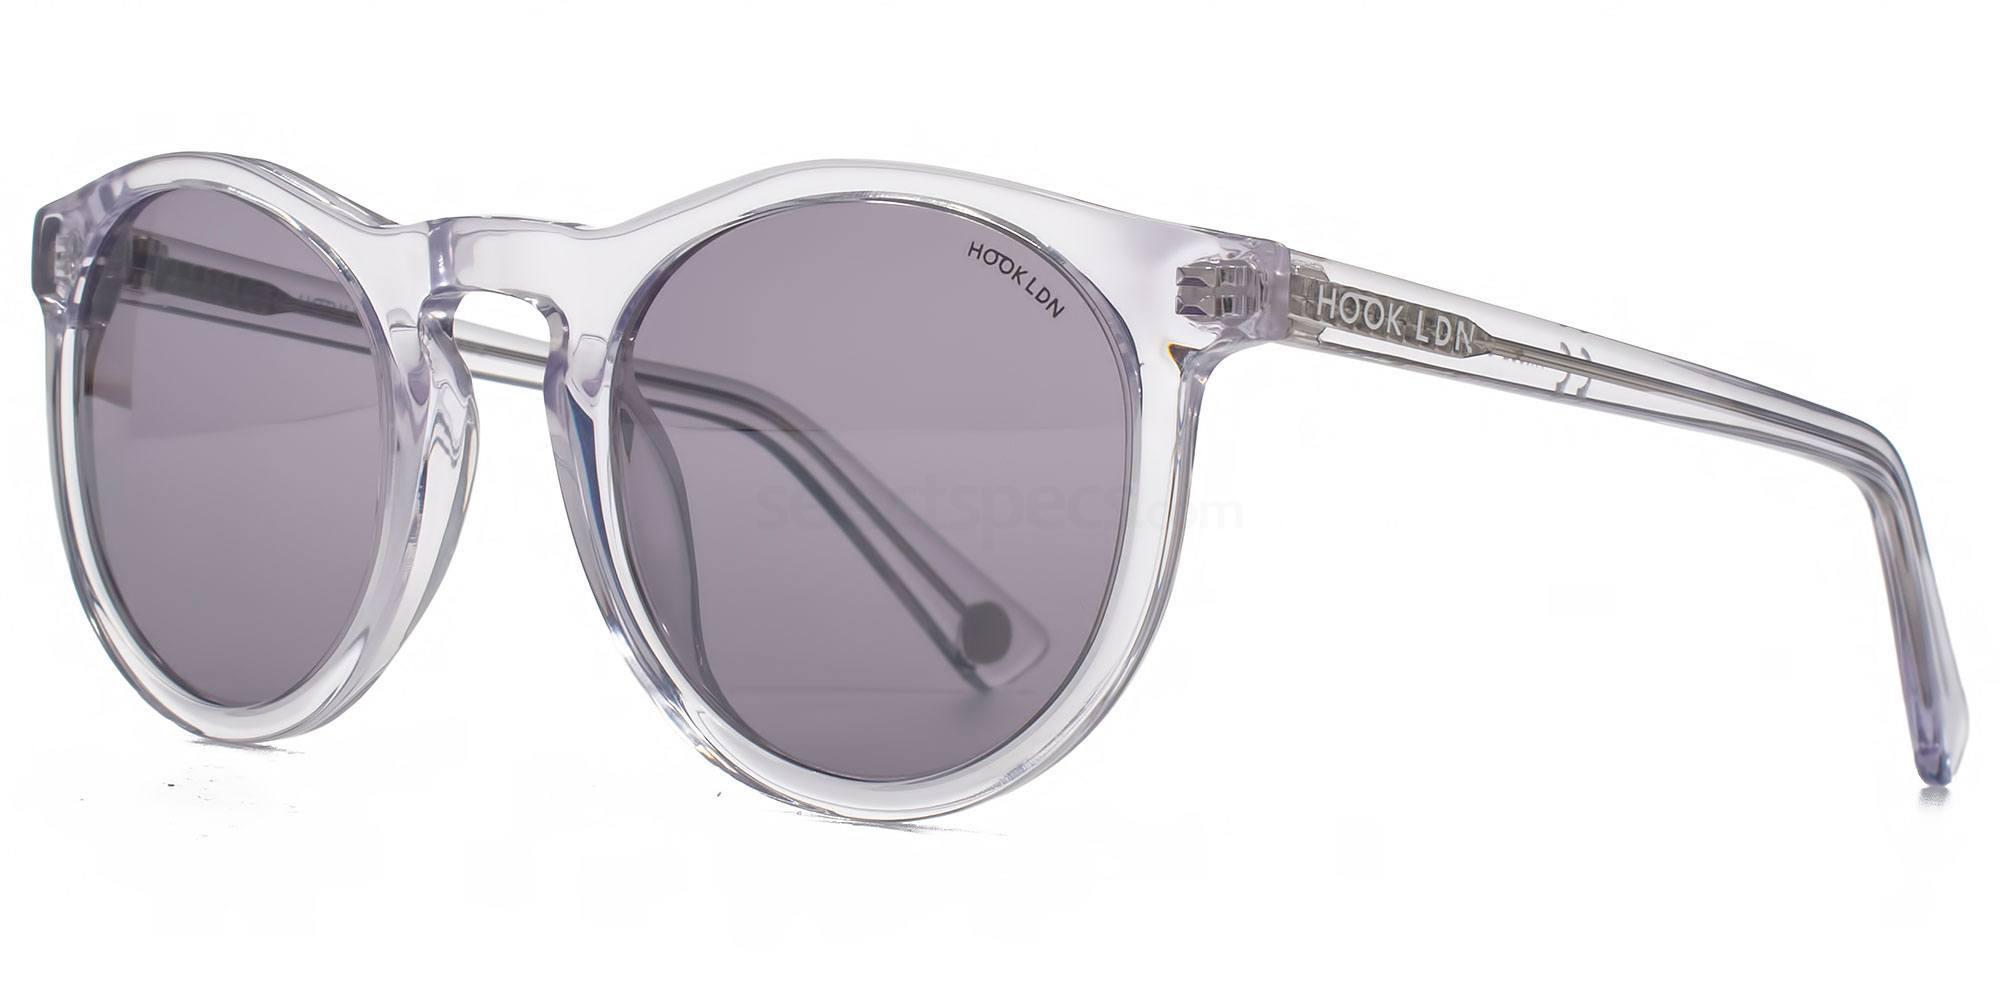 CLR HK002 - PARK LIFE Sunglasses, Hook LDN